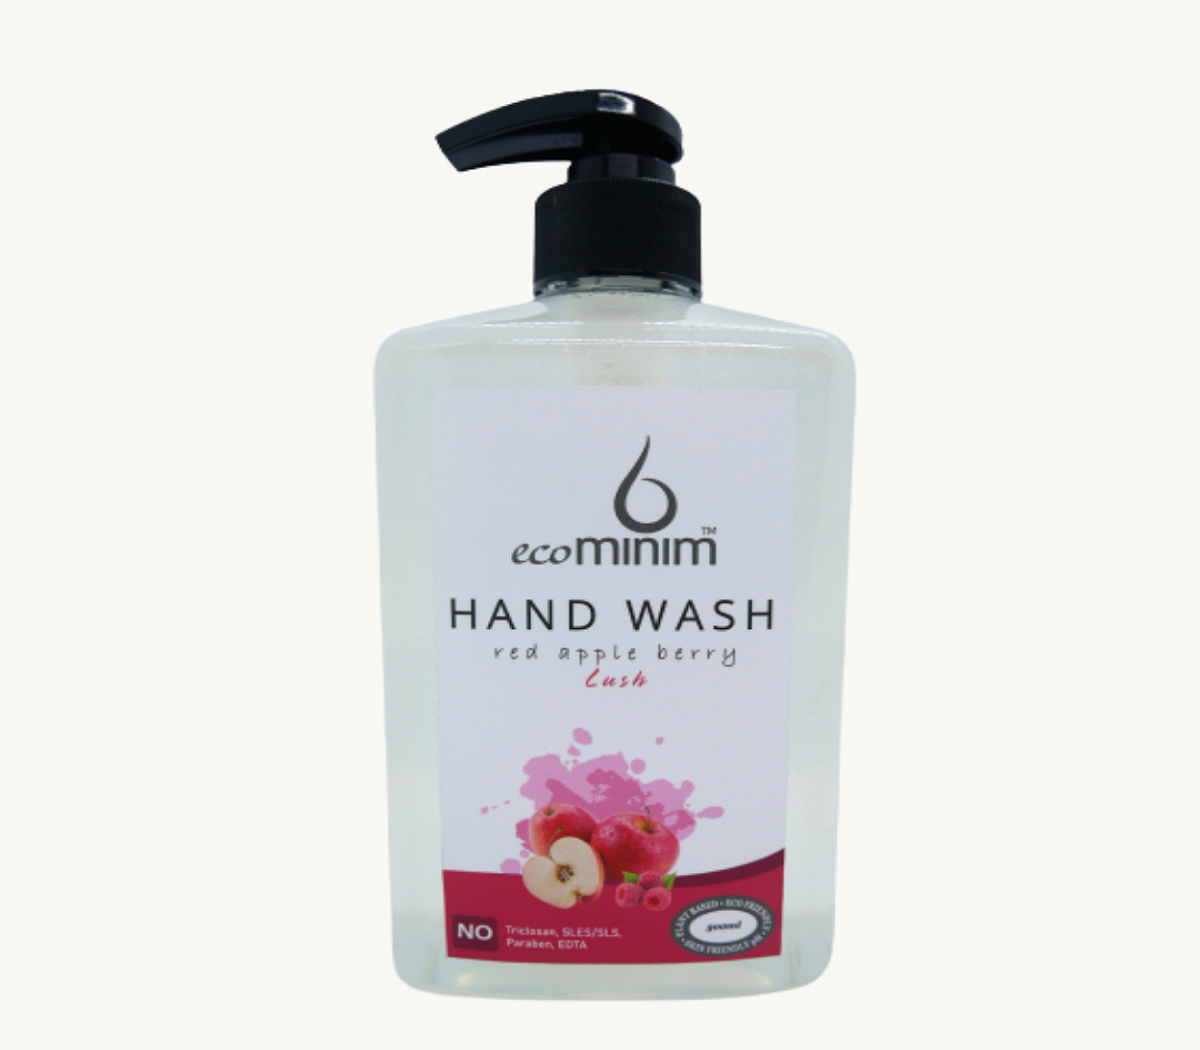 Hand Wash Liquid- Red Apple Berry